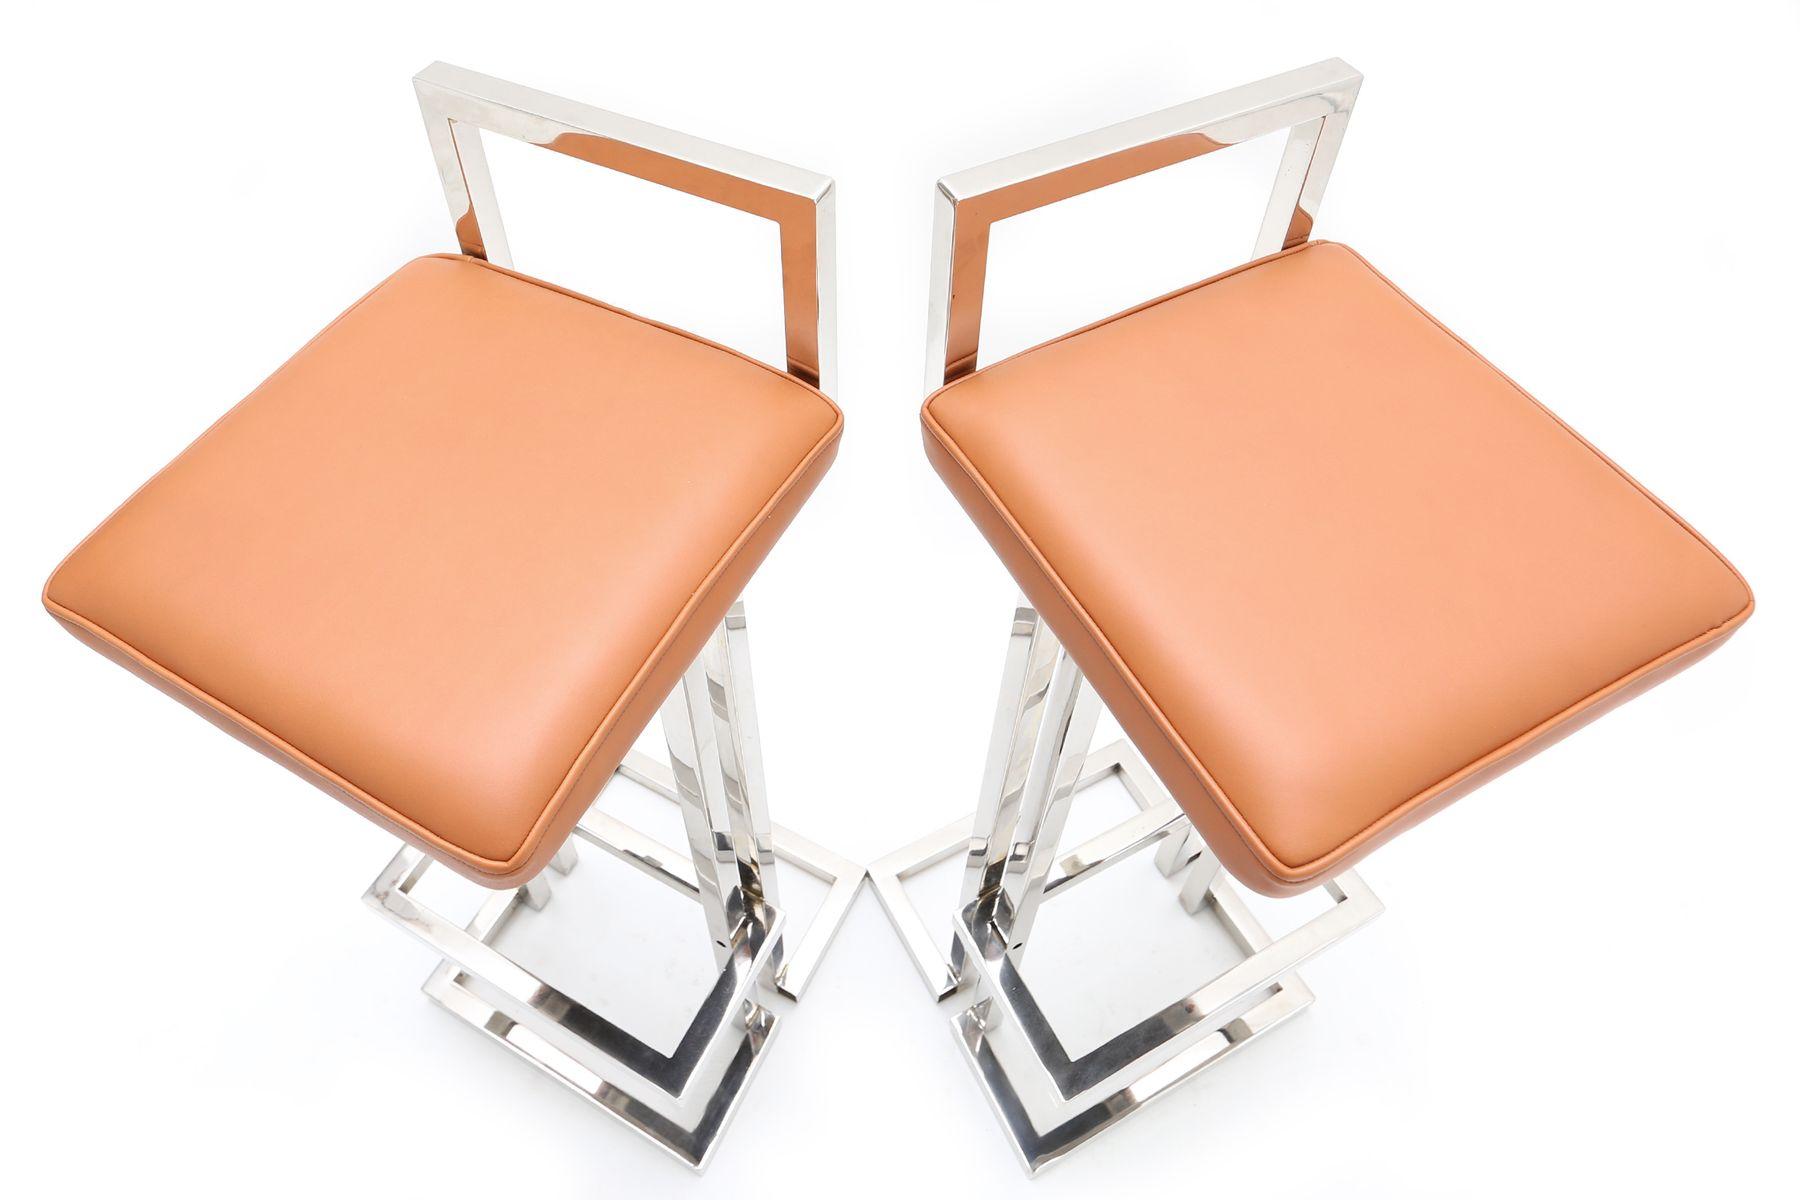 100 bar stools brushed steel dakota brushed stainless steel